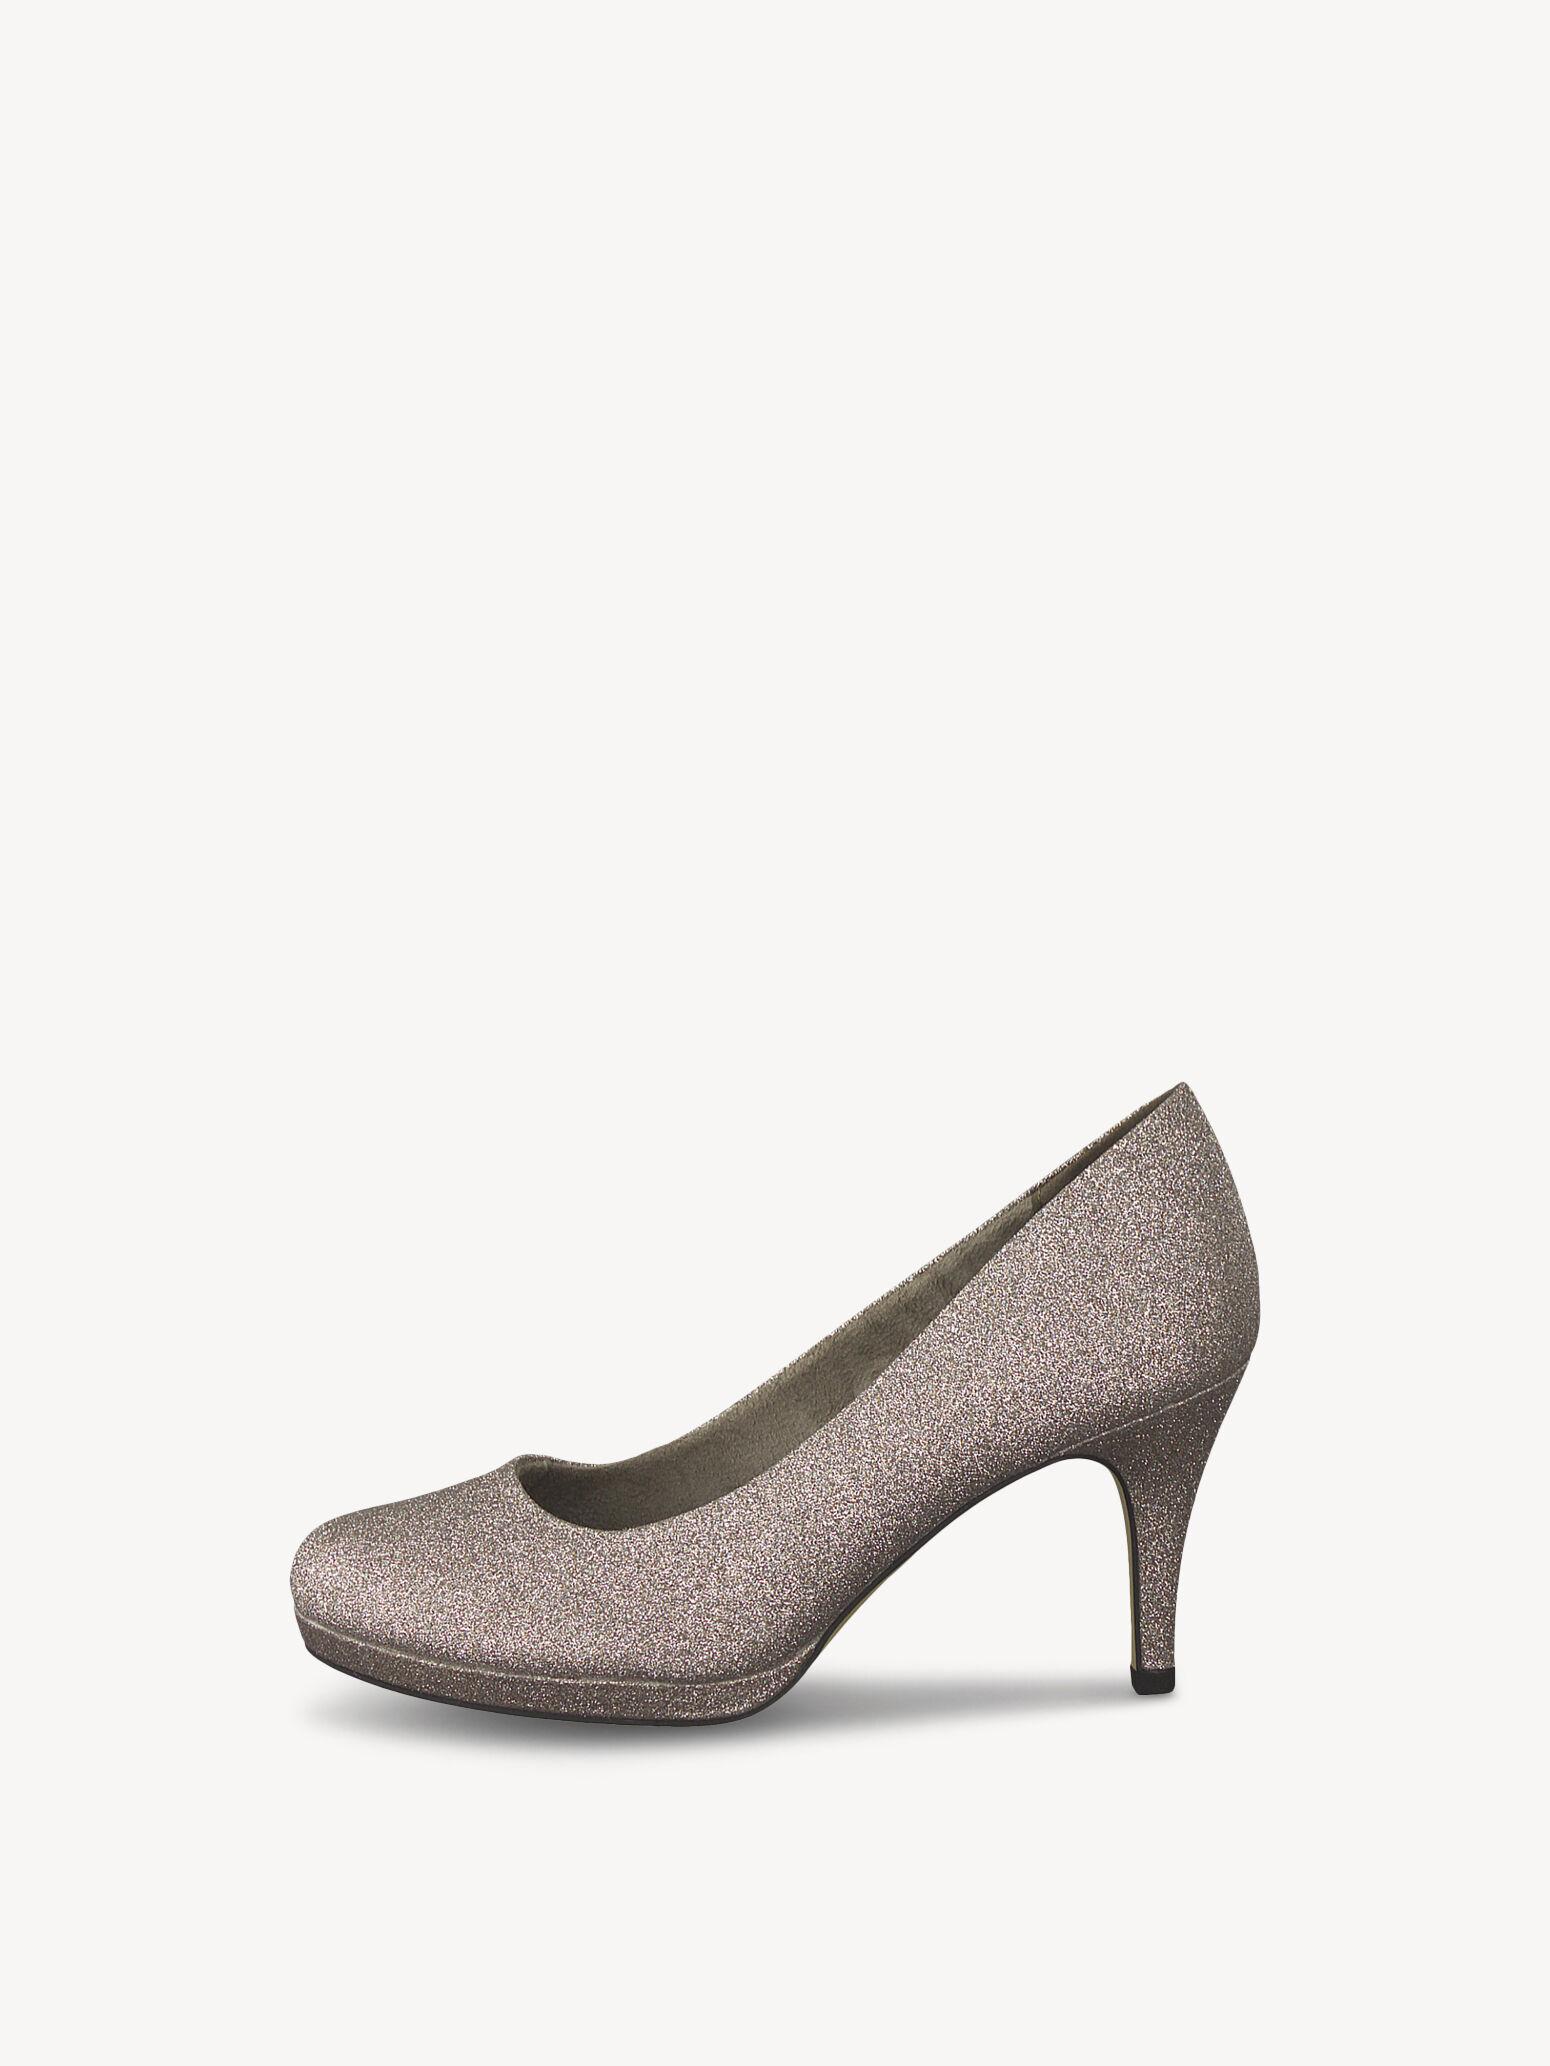 6cm Spitze Damen Absatz Pumps Blockabsatz Schleife Mit Heels